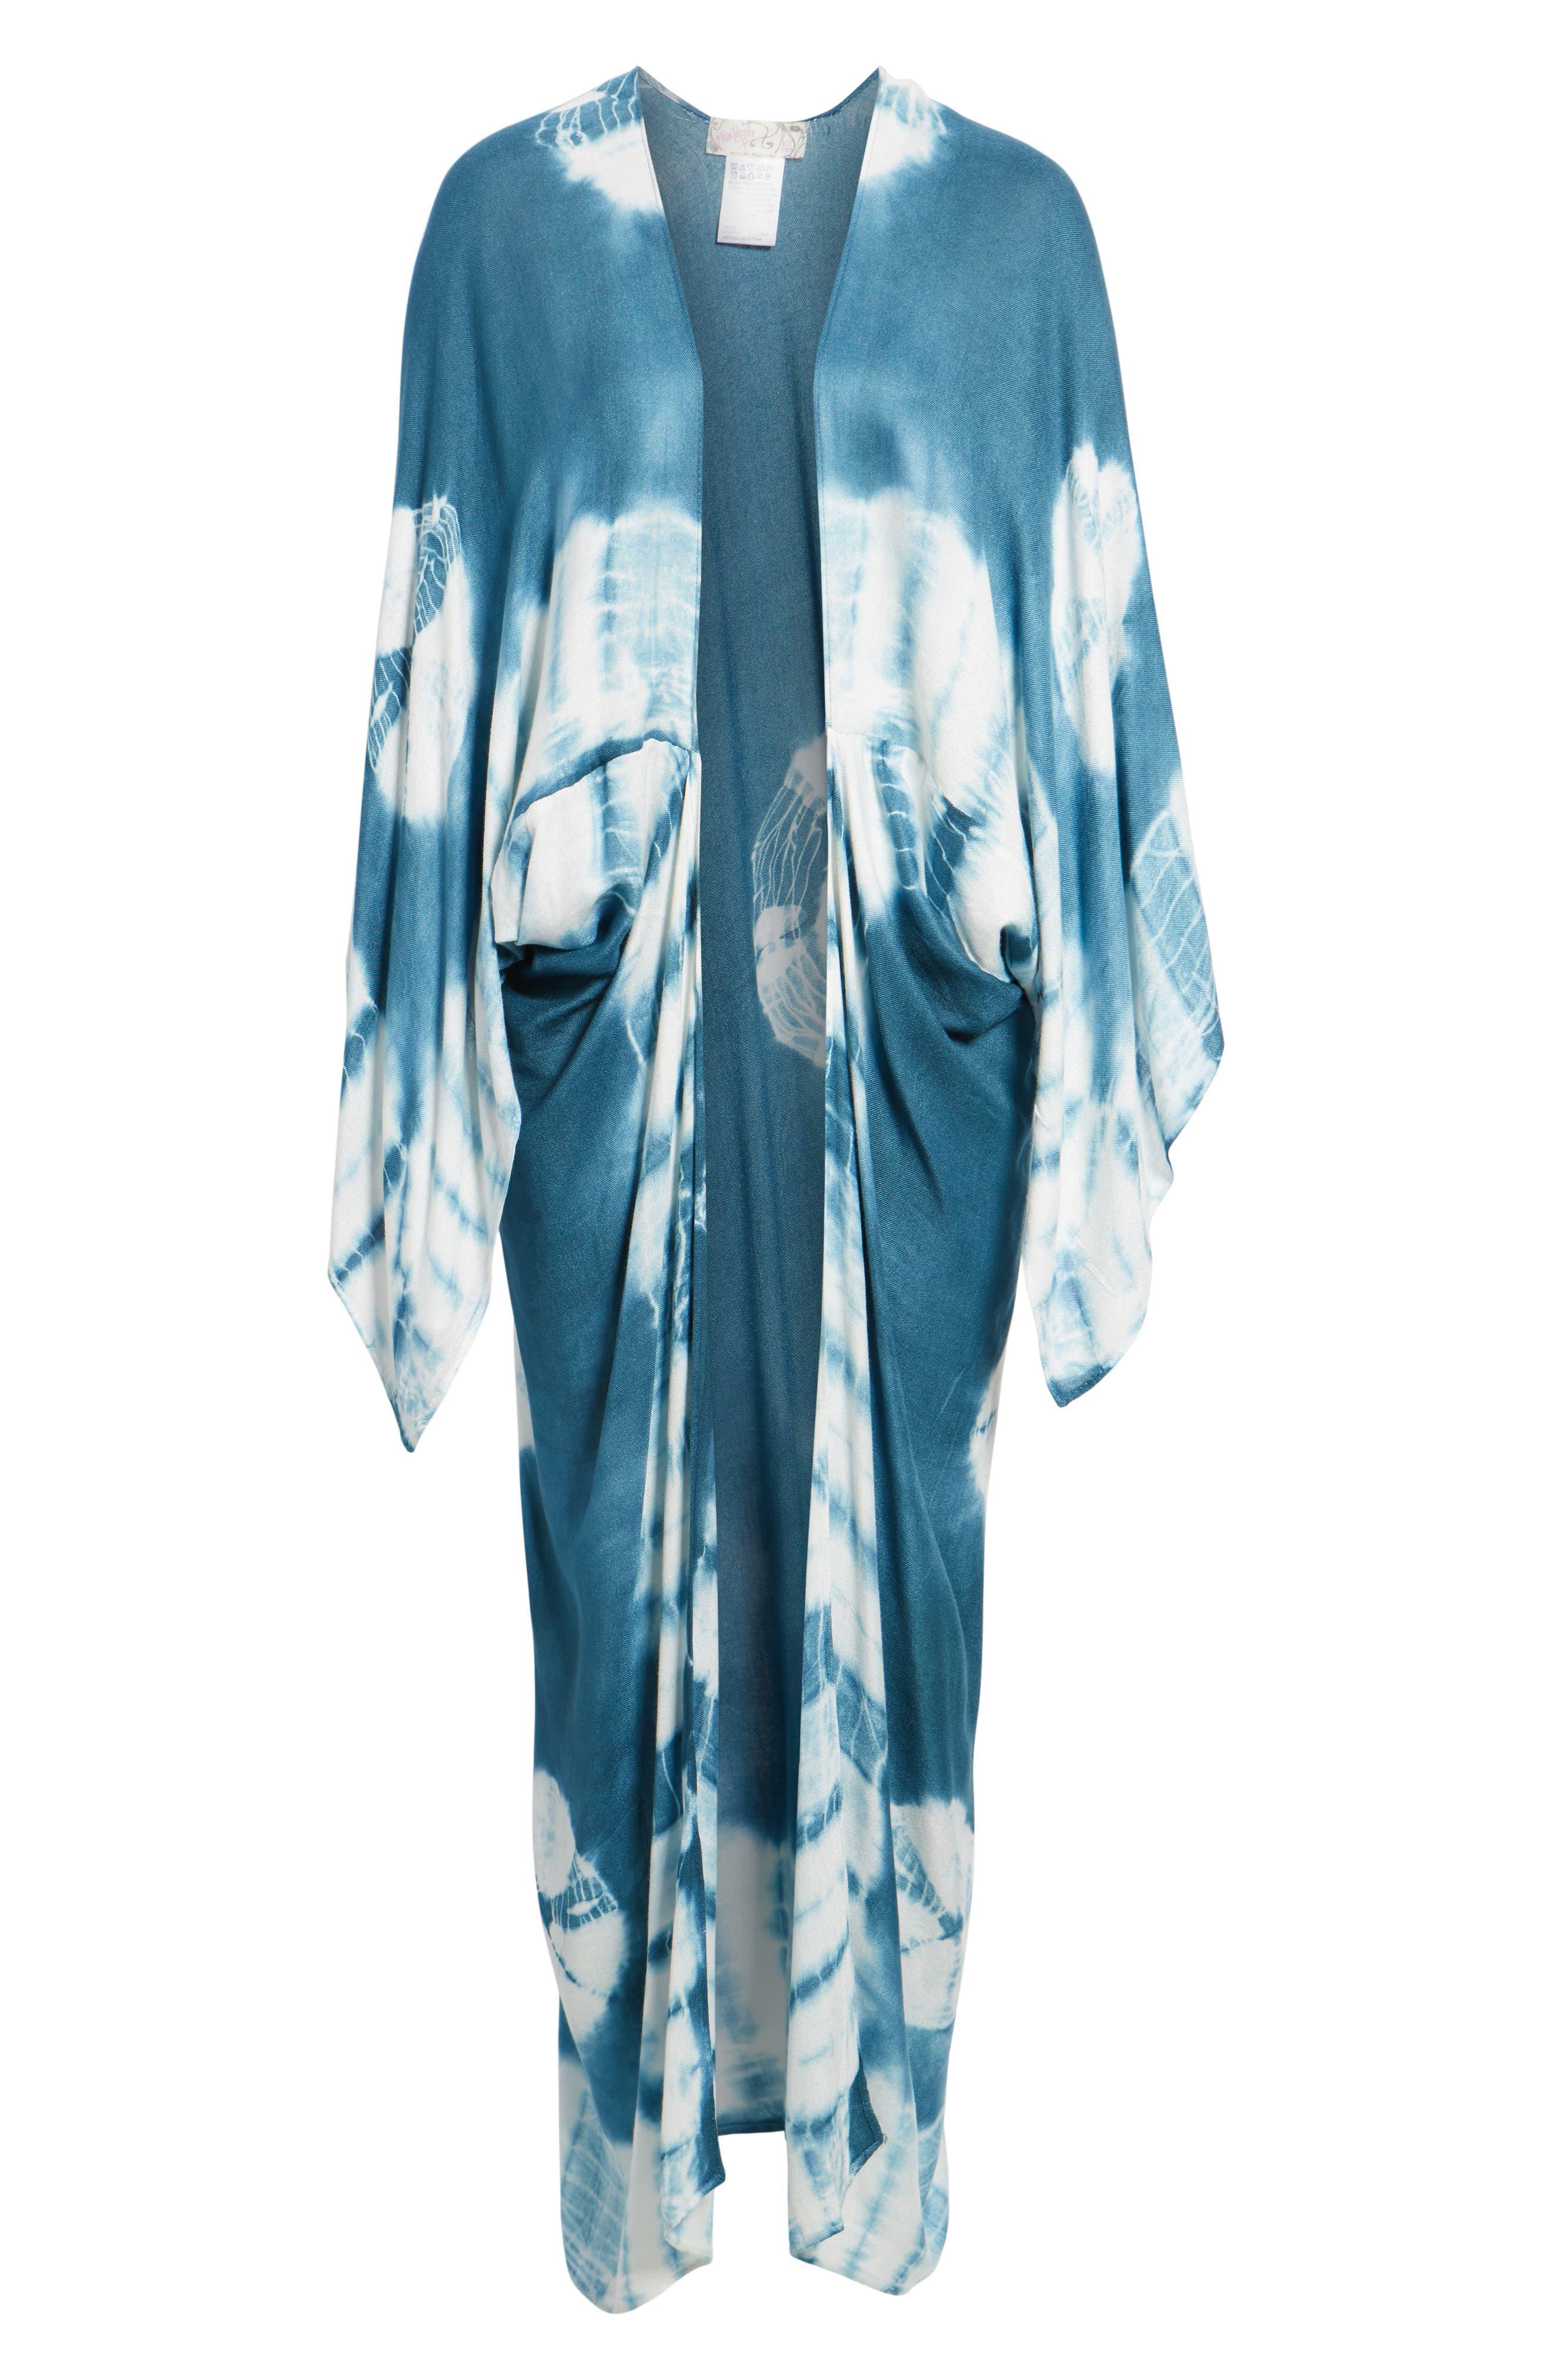 Spellbound Tie Dye Kimono Duster,                             Alternate thumbnail 6, color,                             Ocean